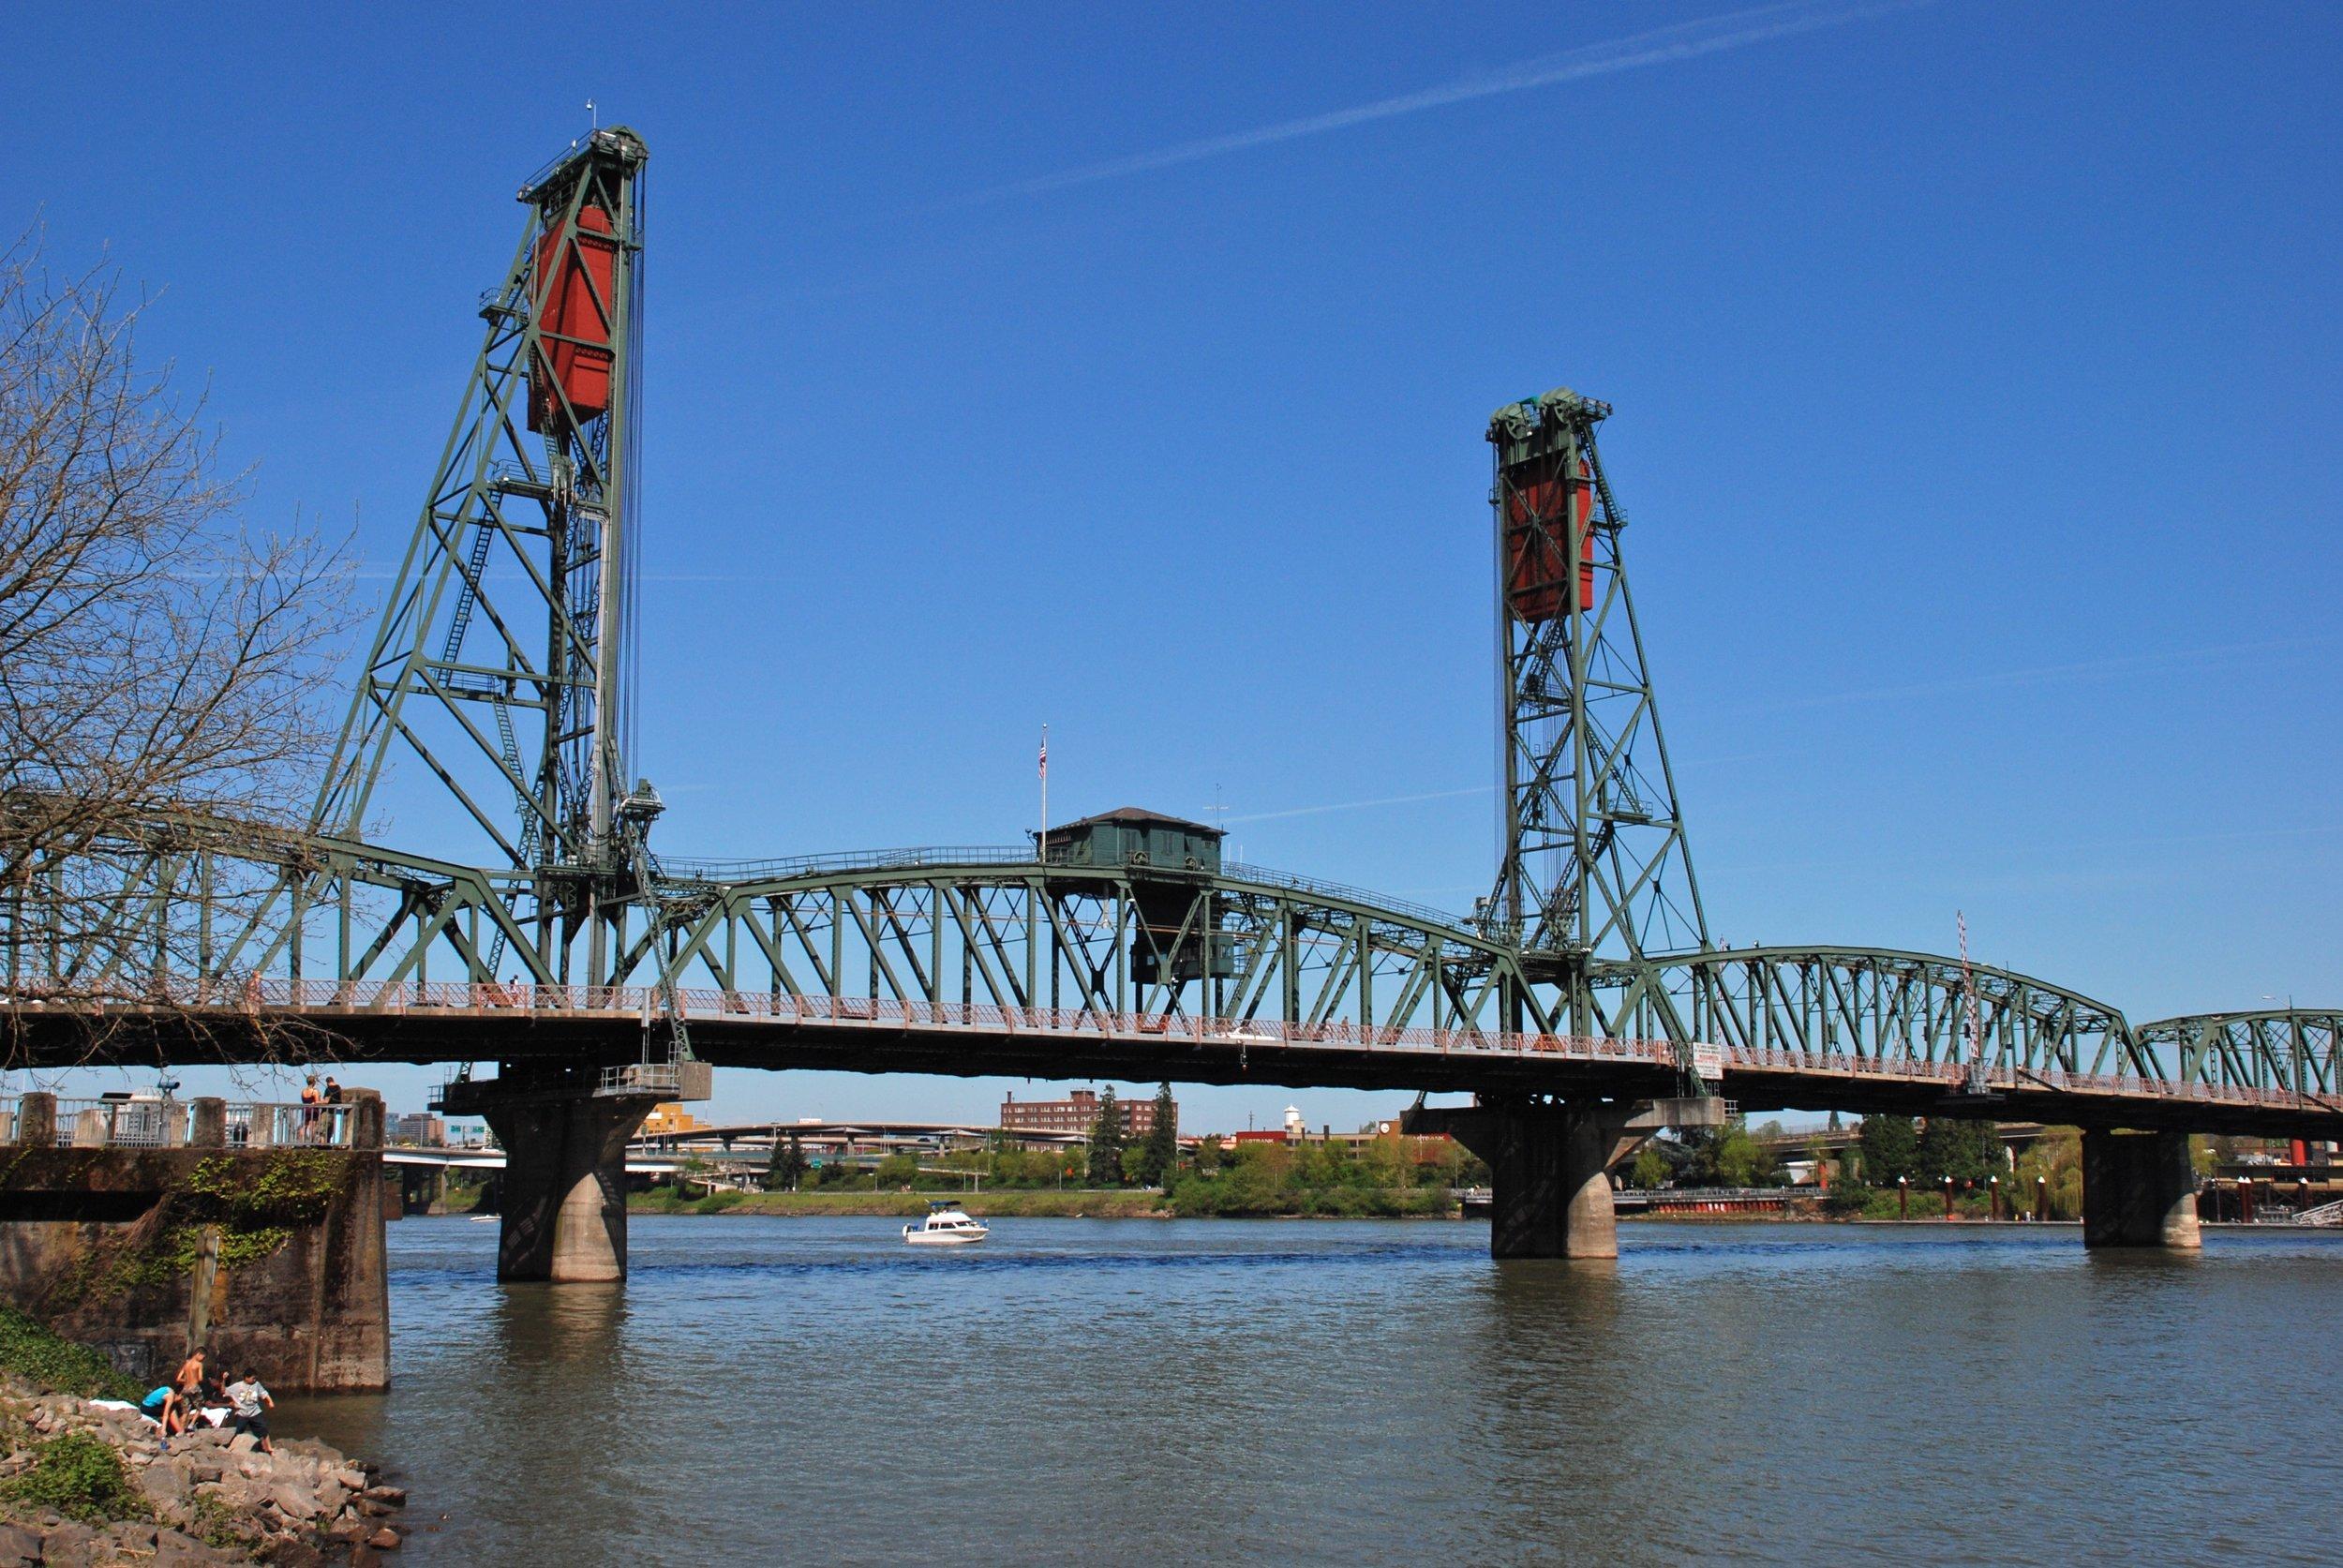 Hawthorne_Bridge_(Portland,_Oregon)_from_southwest,_2012.jpg